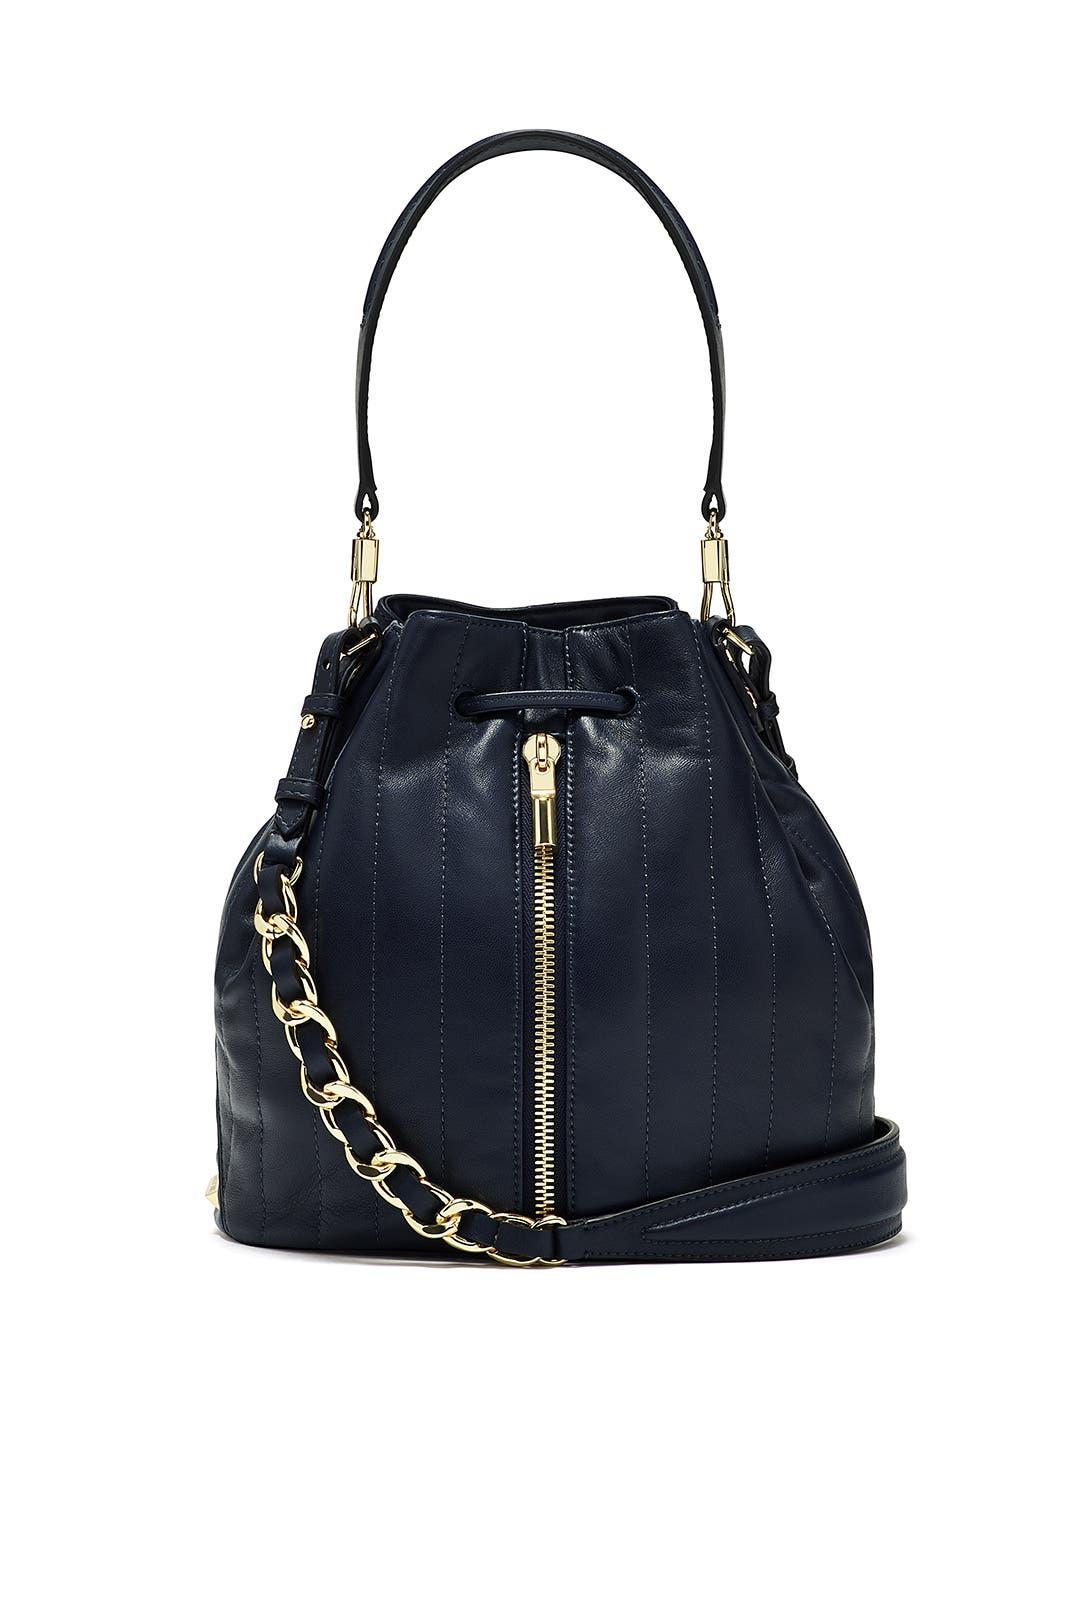 Navy Cynnie Bucket Bag by Elizabeth and James Accessories